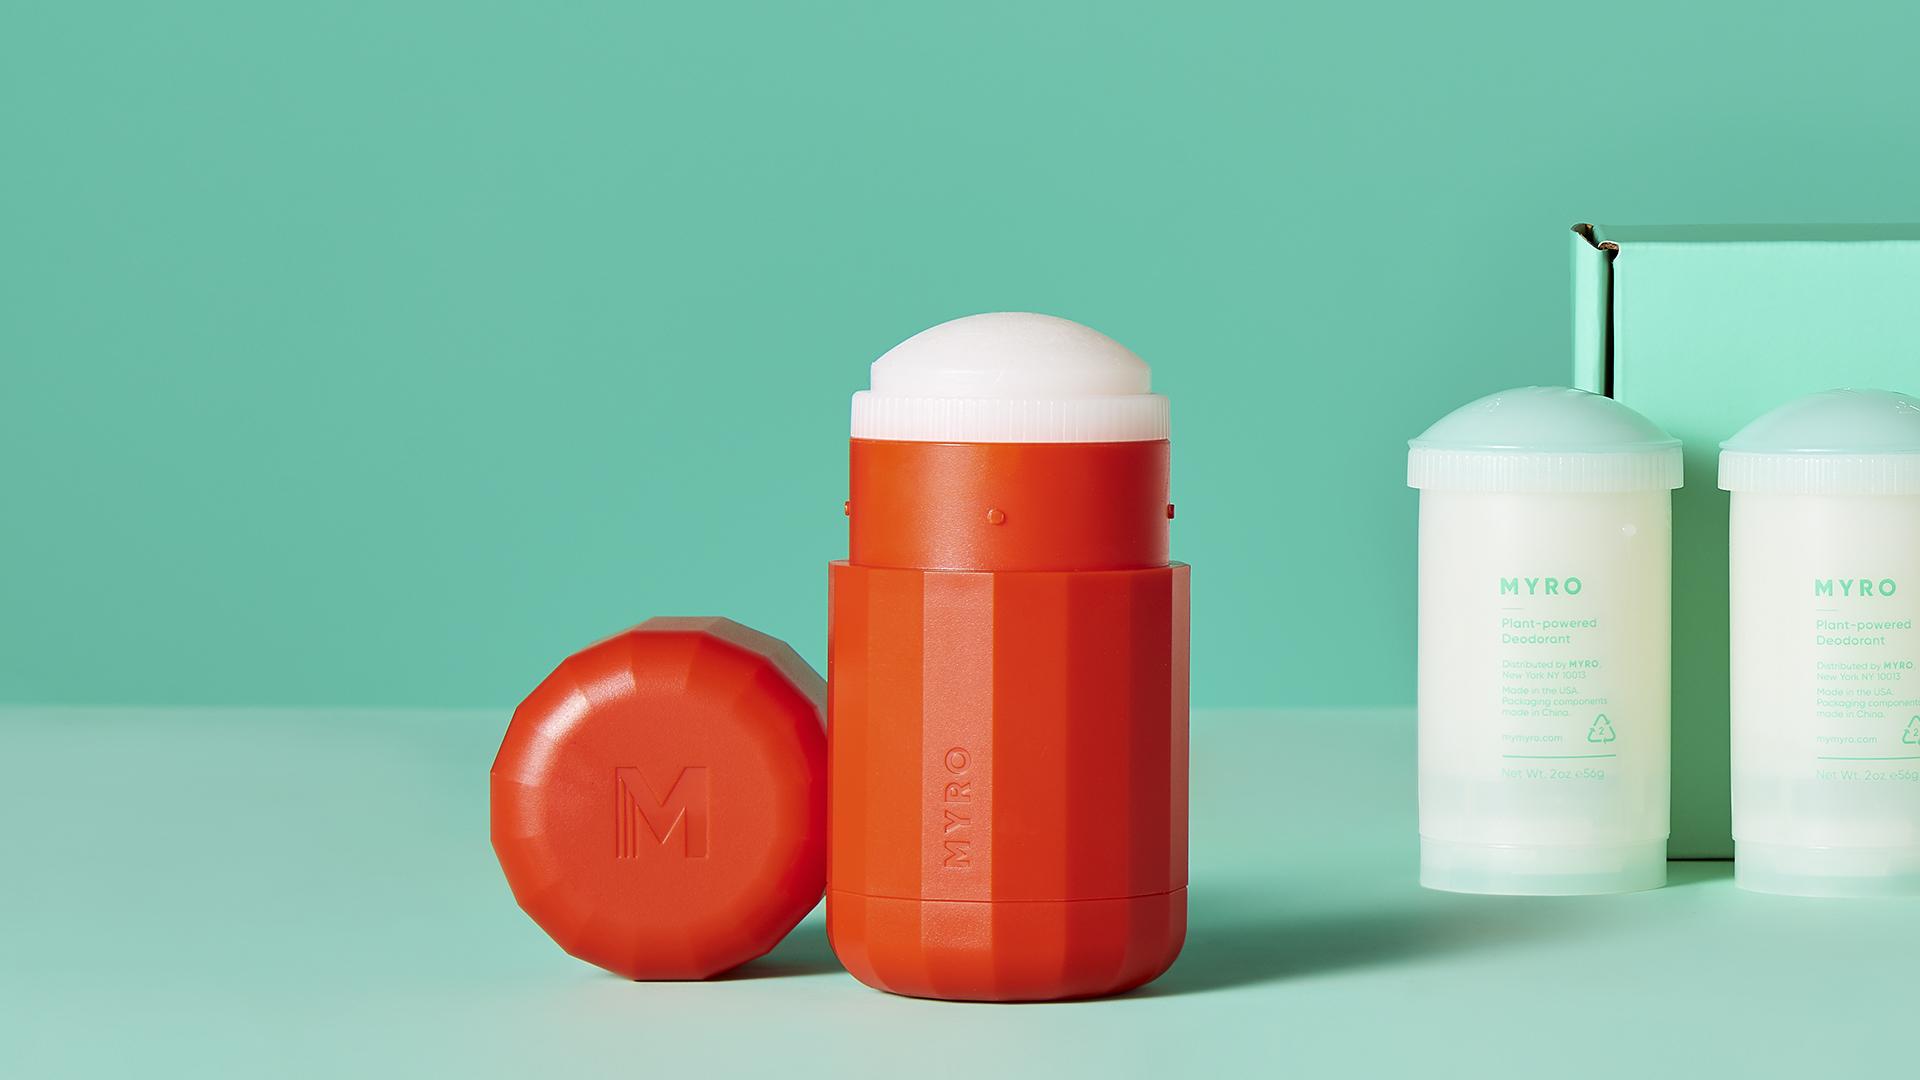 myro deodorant review a travel